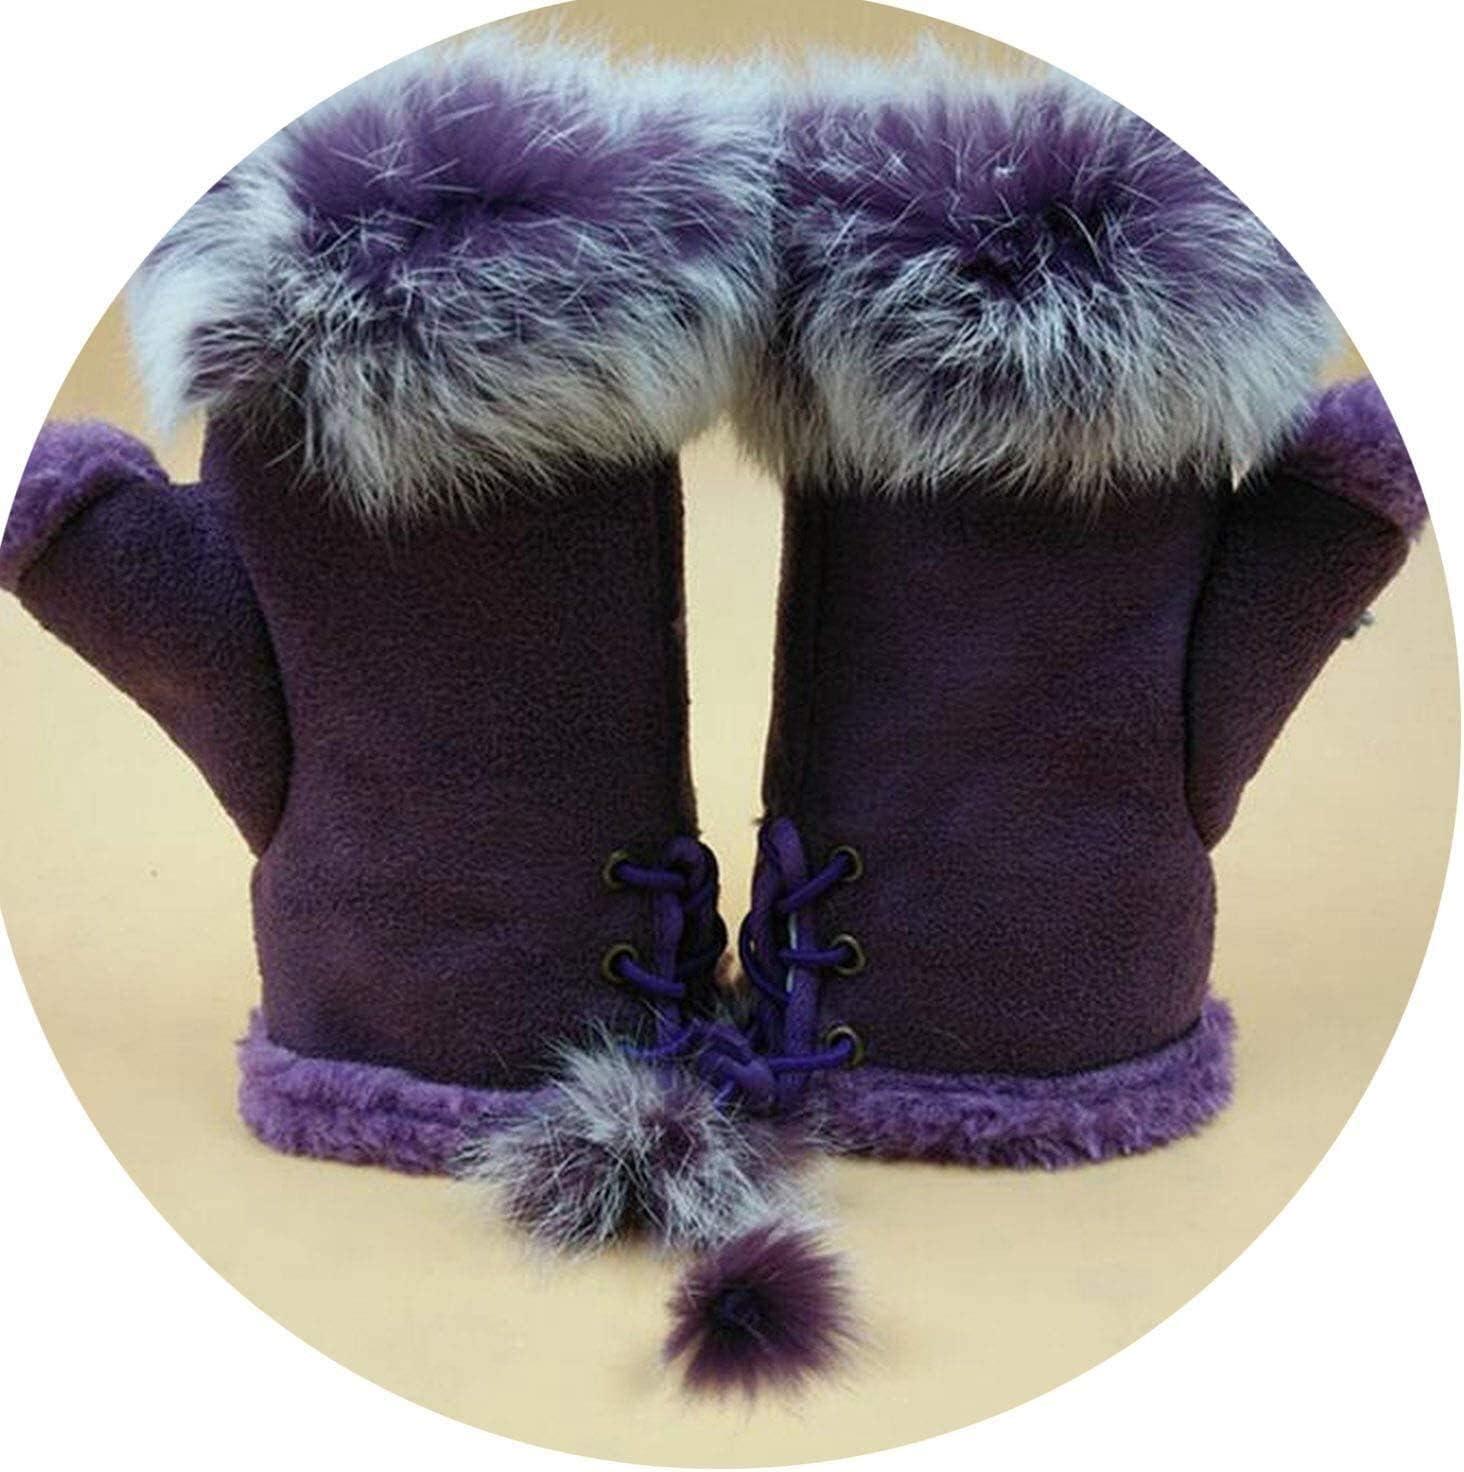 Samantha Warm Gloves Female Rabbit Hair Wrist Gloves Fingerless Computer Typing Mittens Winter Women Suede Leather Warm Thick Cashmere Gloves (Color : Purple, Size : One Size)